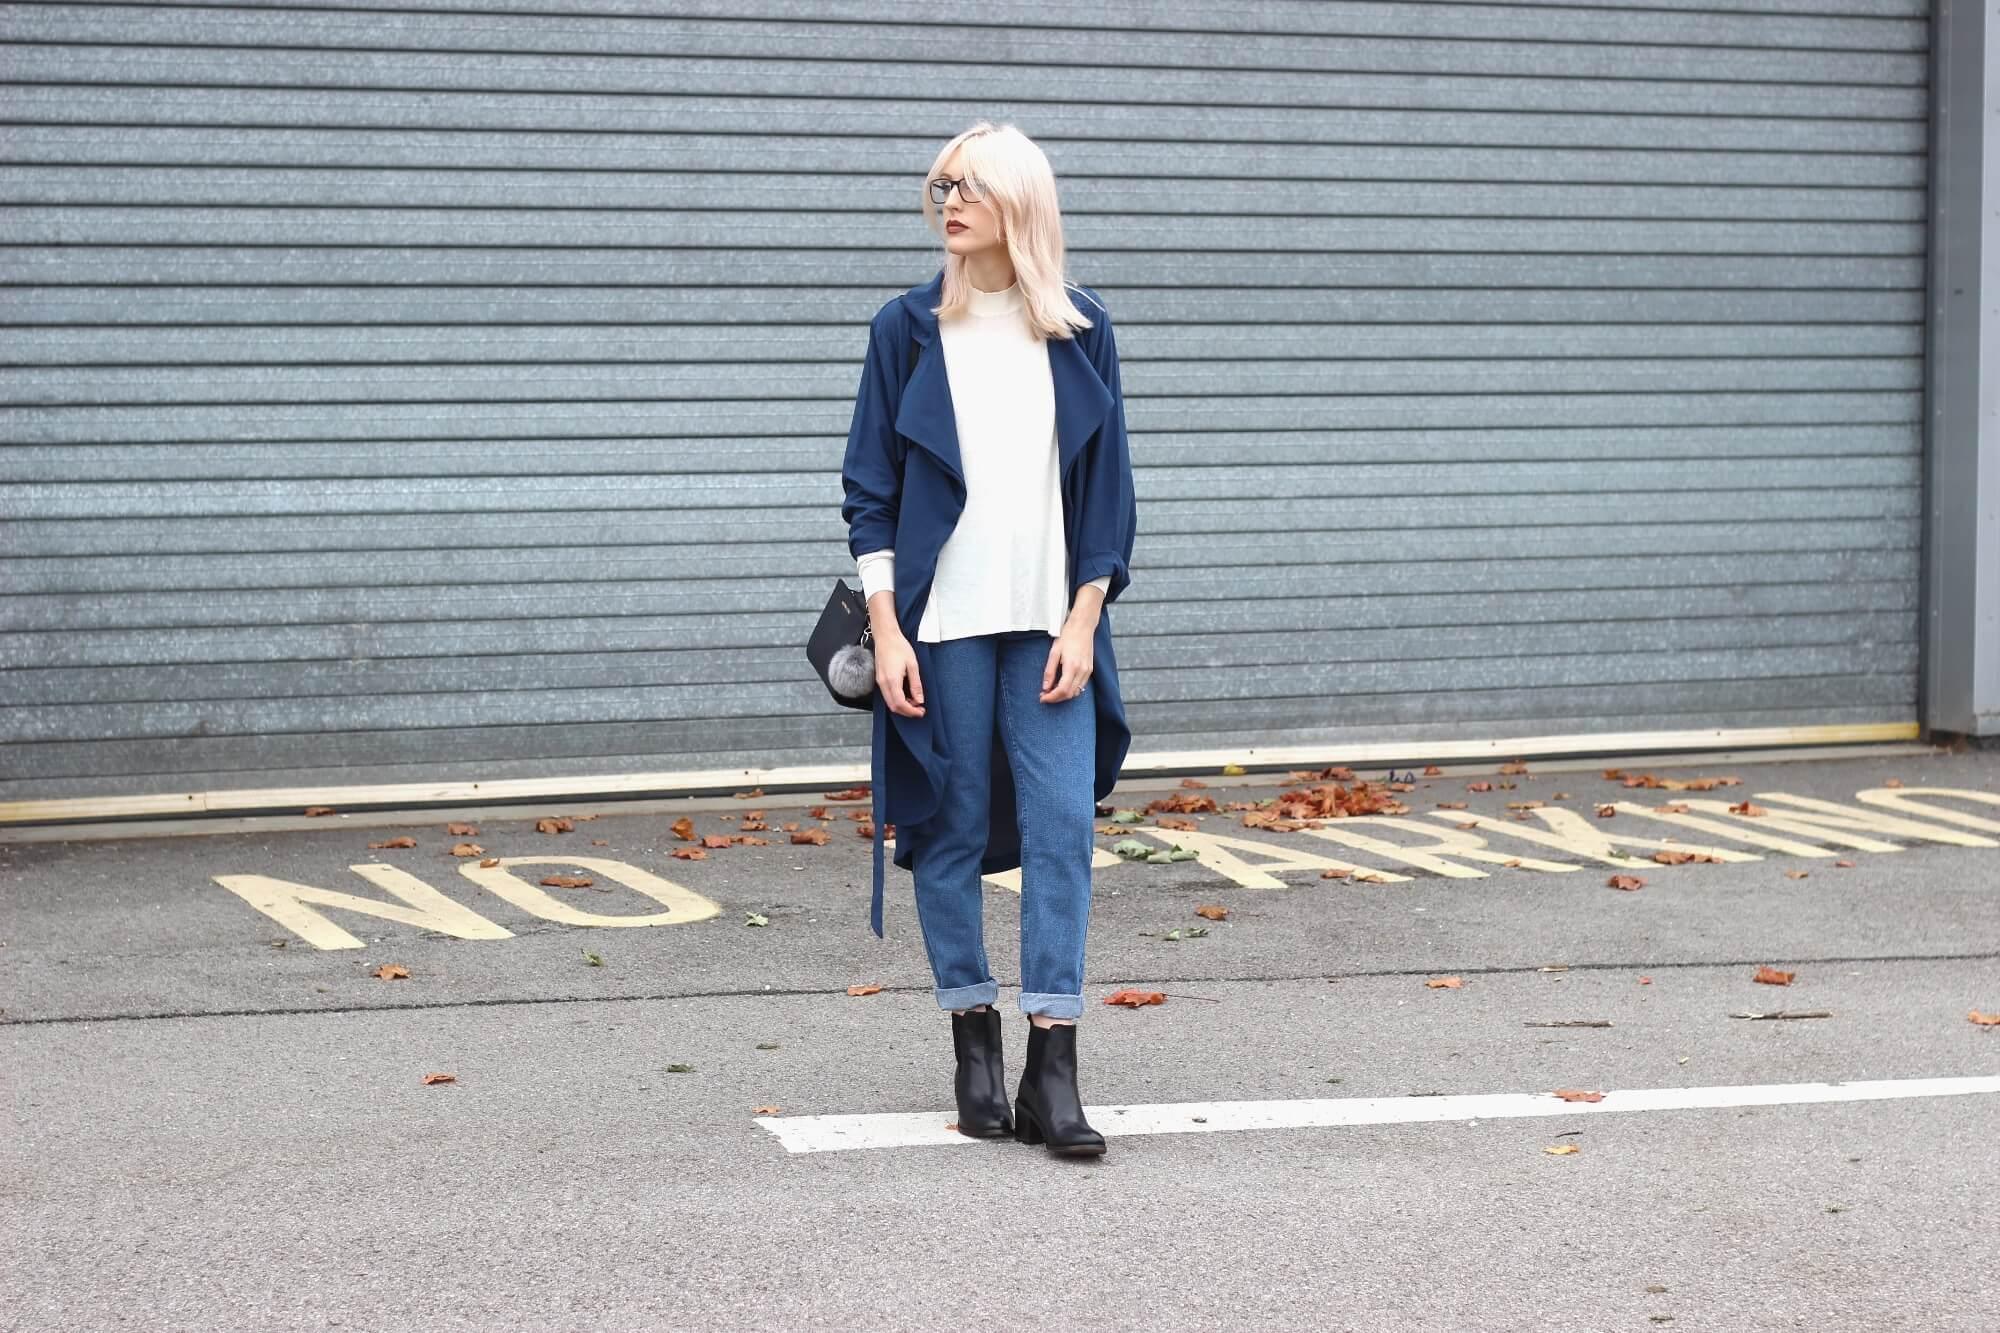 5 Scandinavian Style Tips